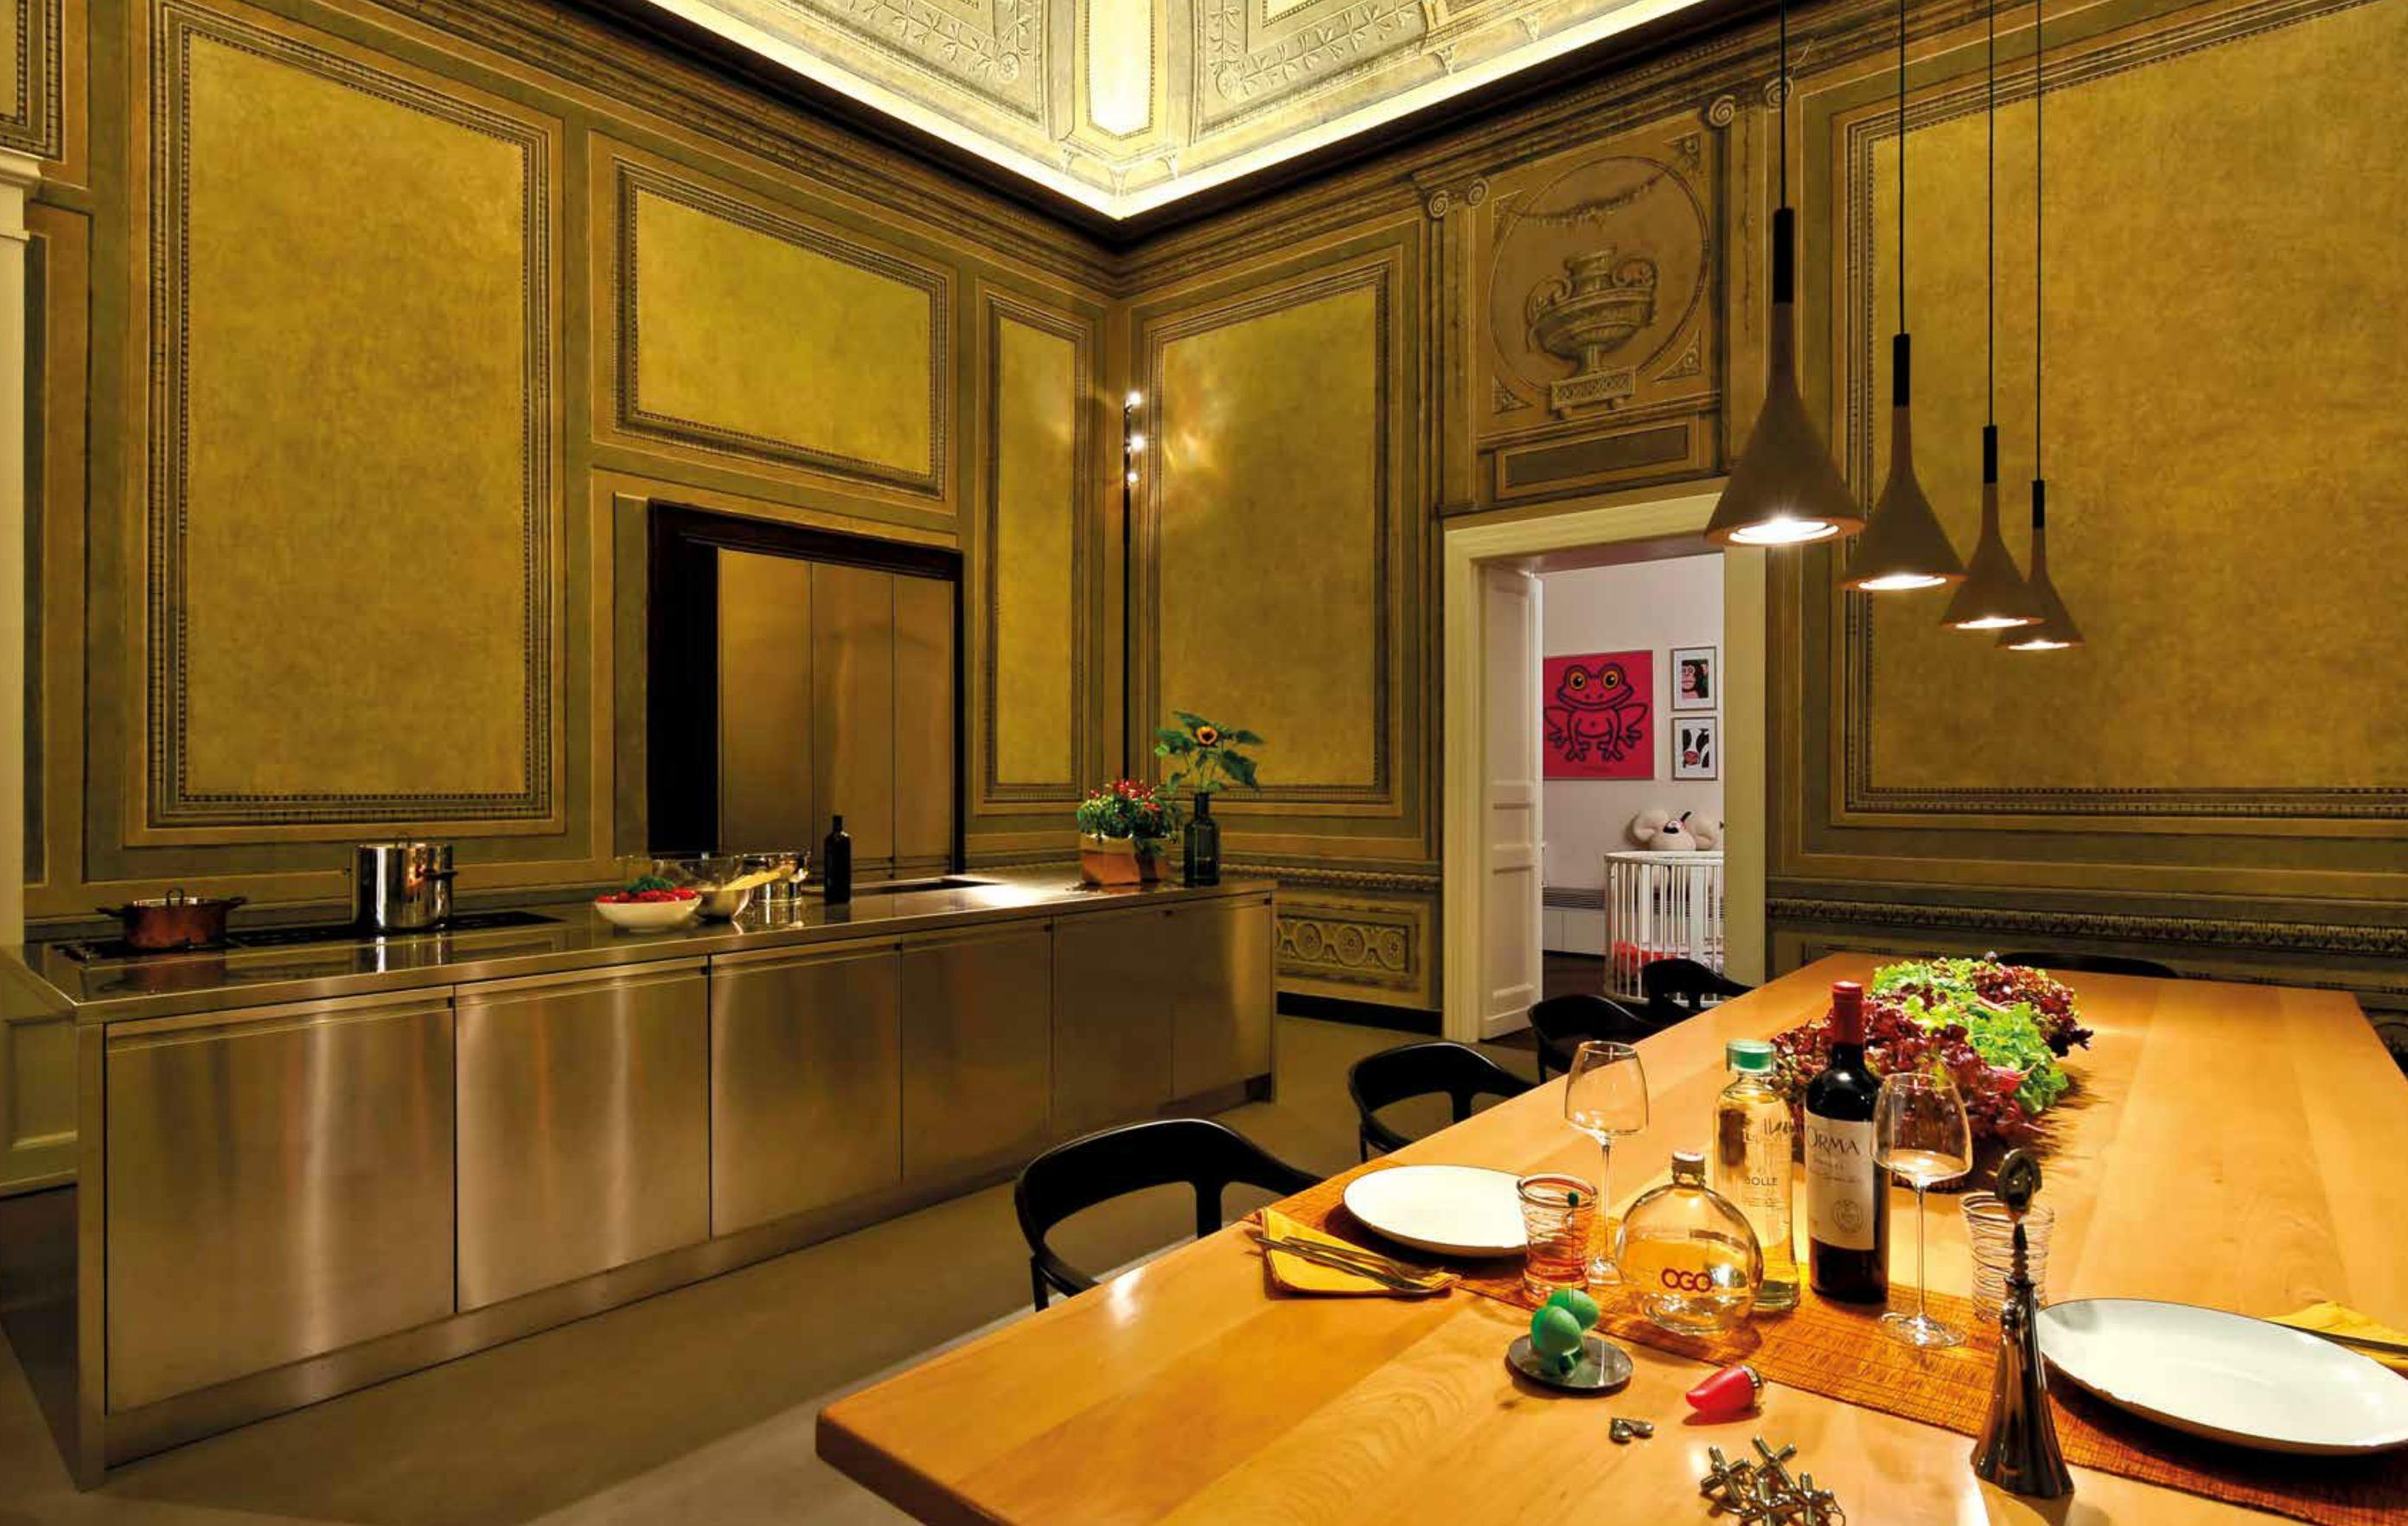 Arredamenti casa zona living with arredamenti casa with - Idea casa arredamenti ...